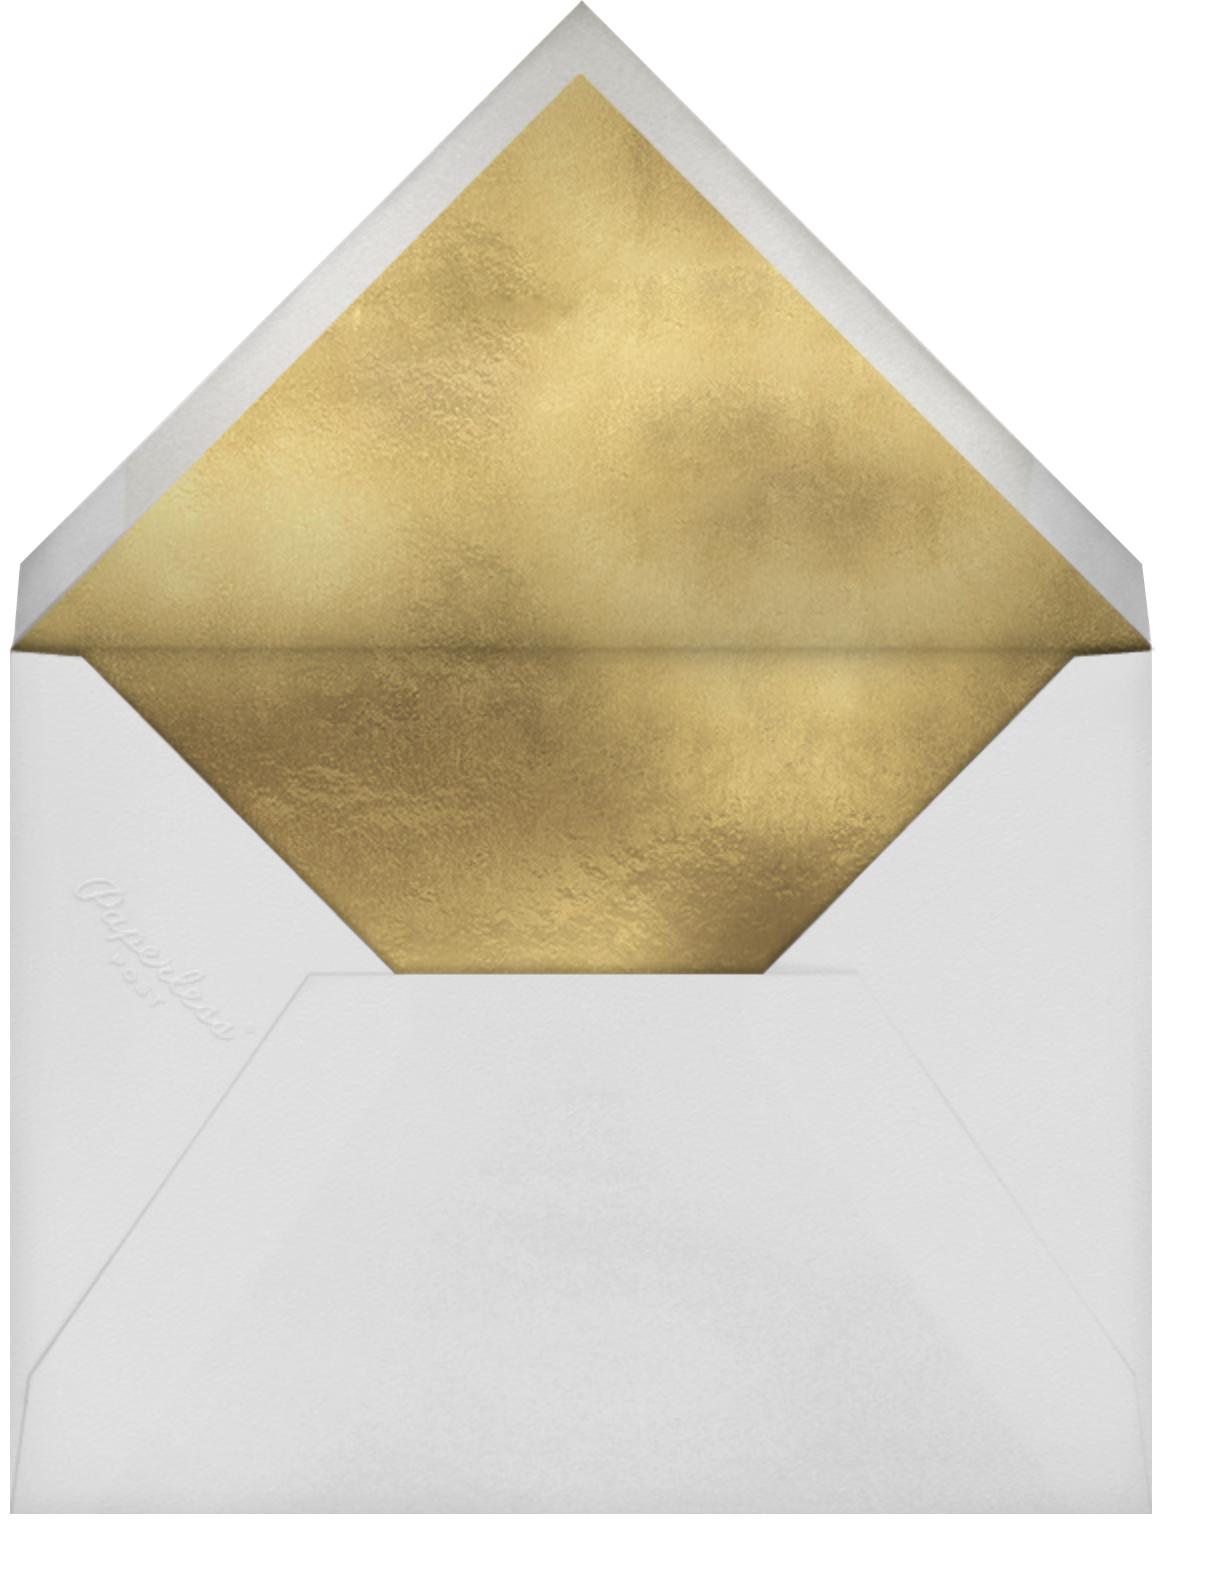 Shake Things Up - Mr. Boddington's Studio - Corporate invitations - envelope back